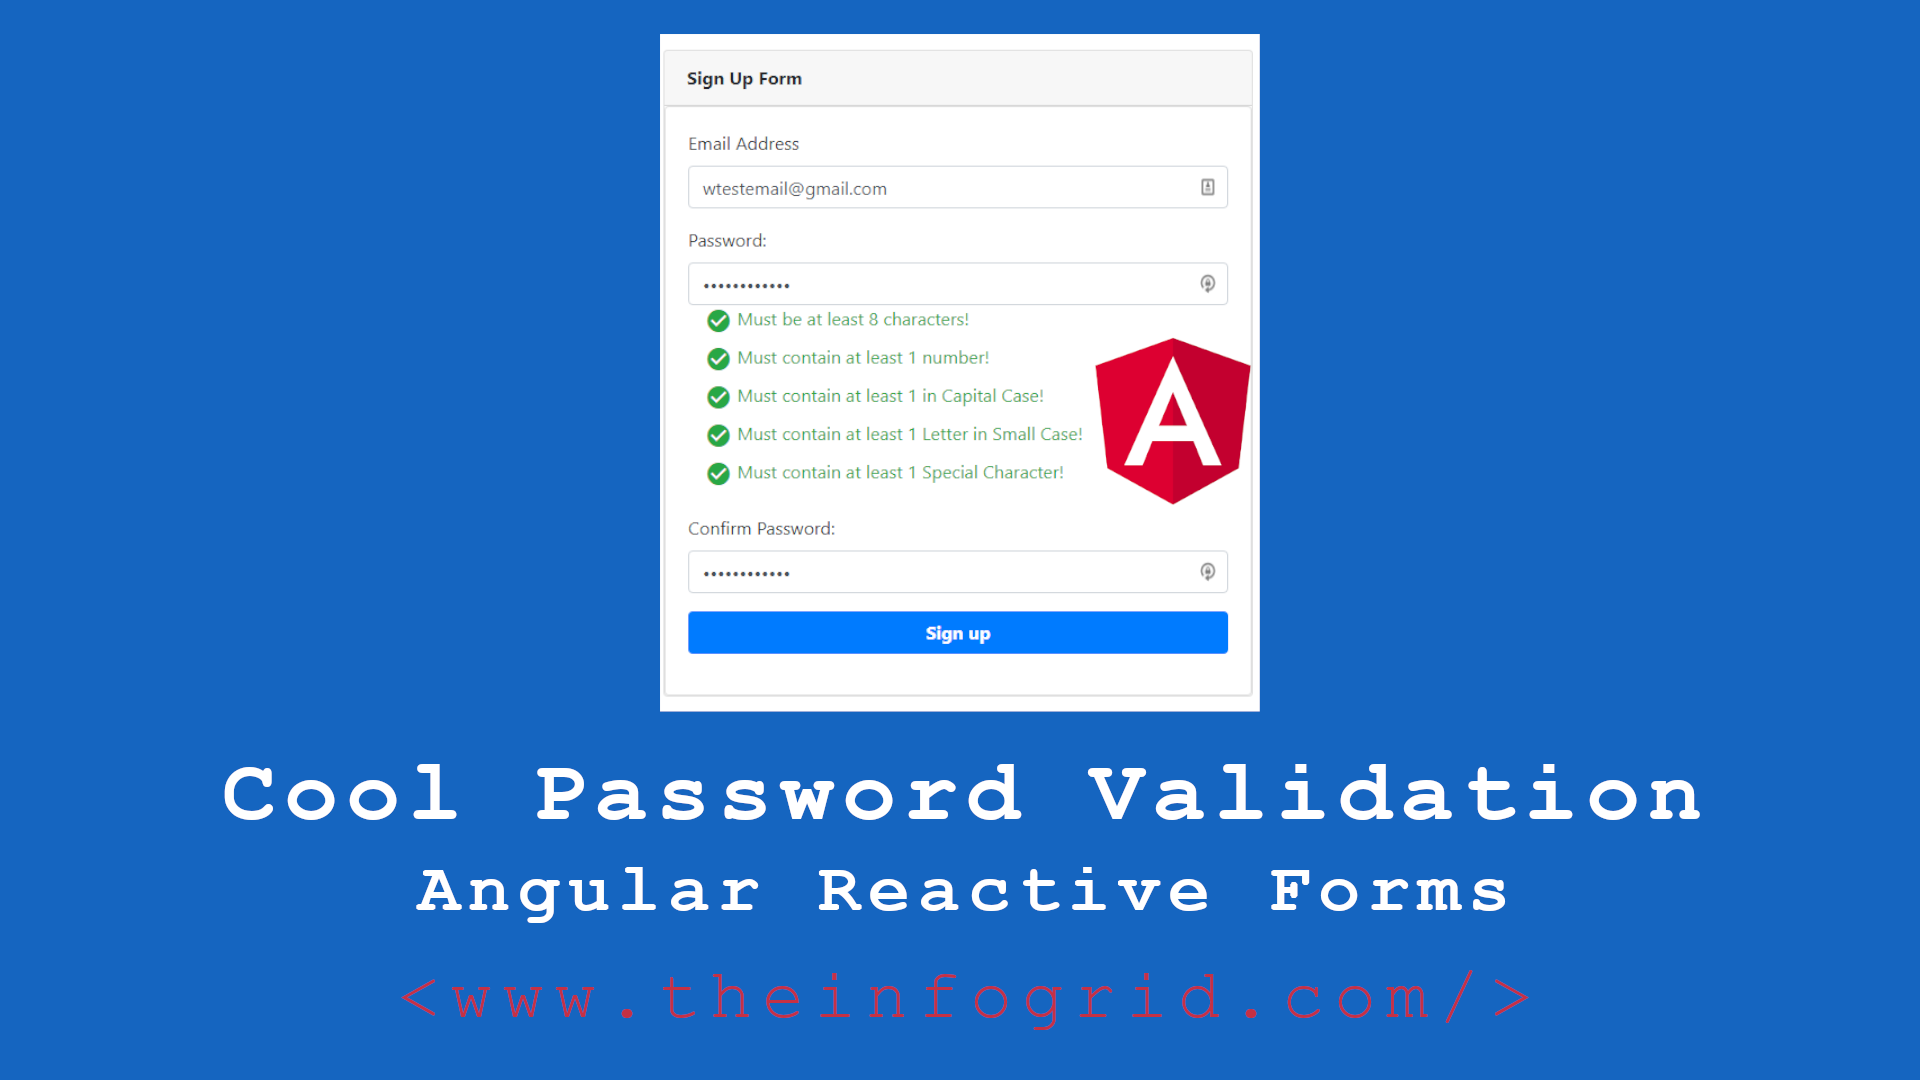 Cool Password Validation – Angular Reactive Forms